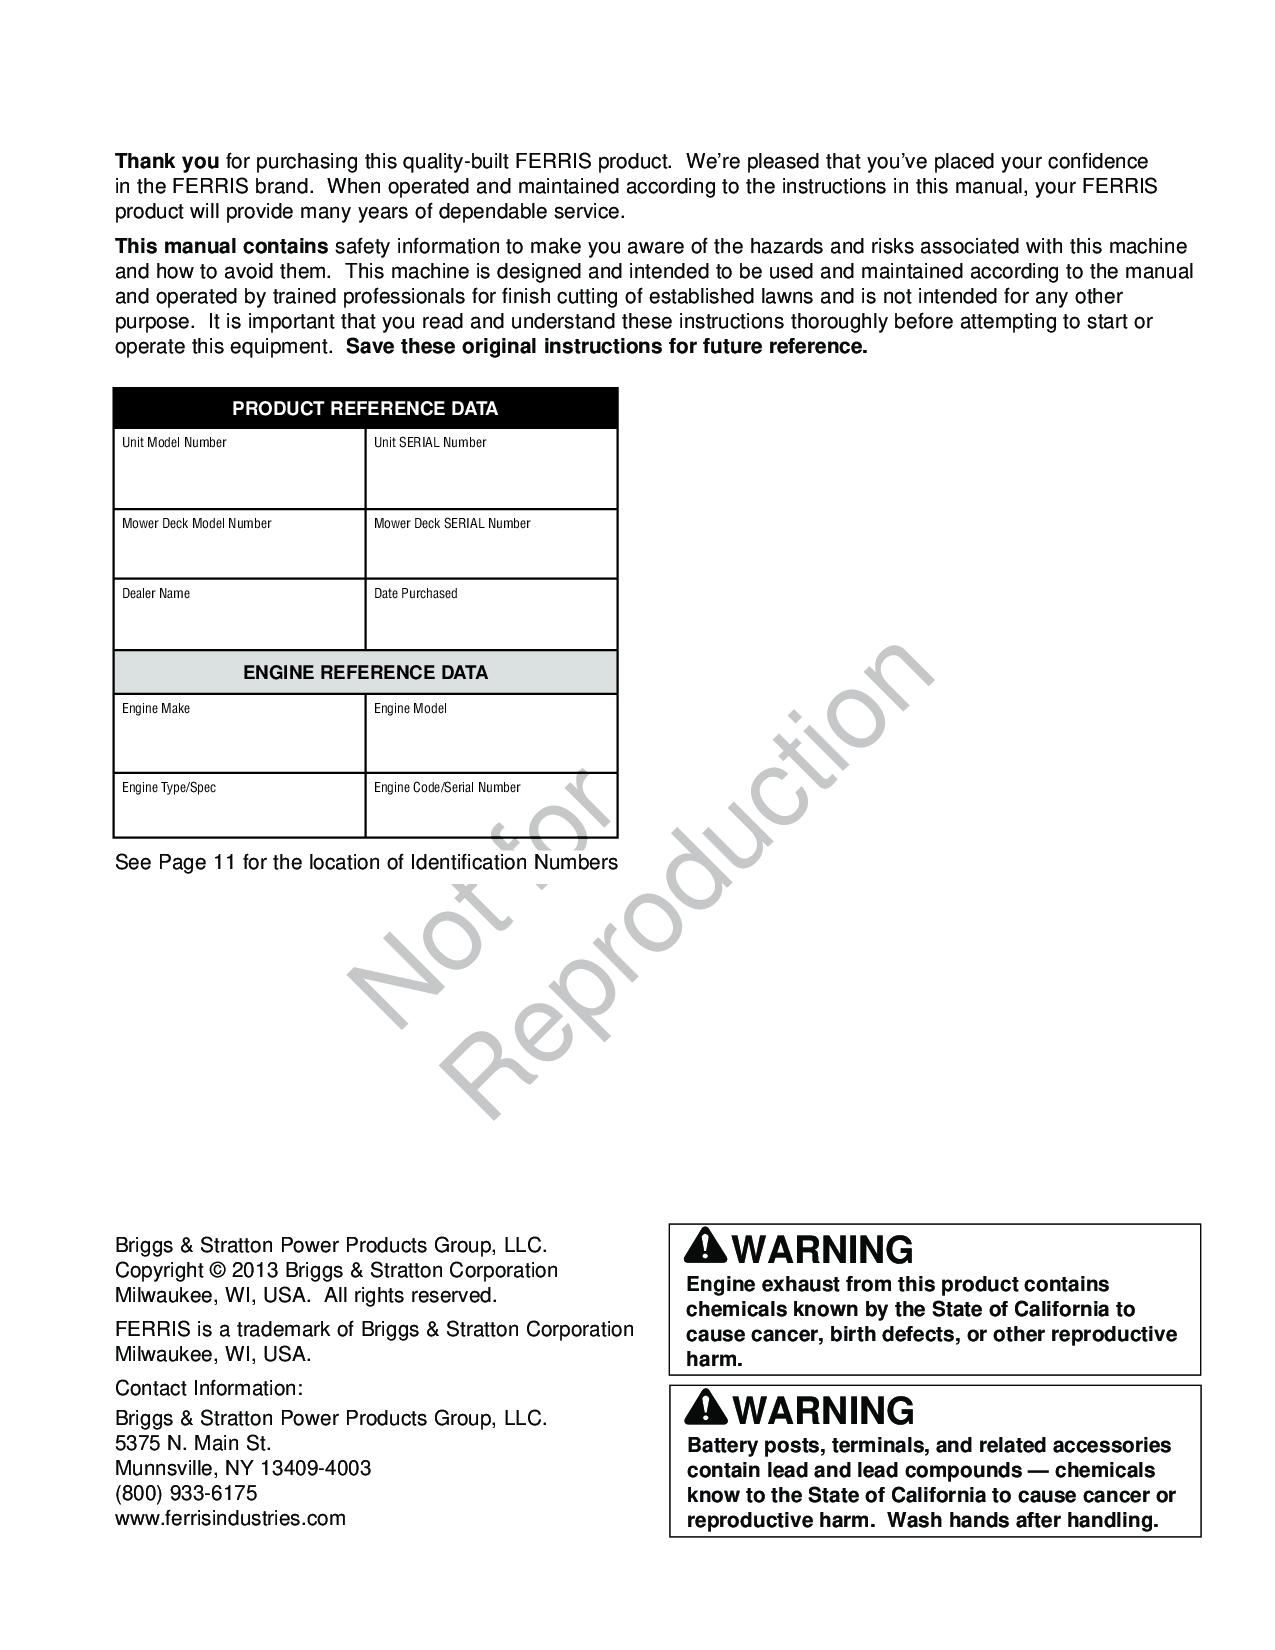 Ferris Engine Manual